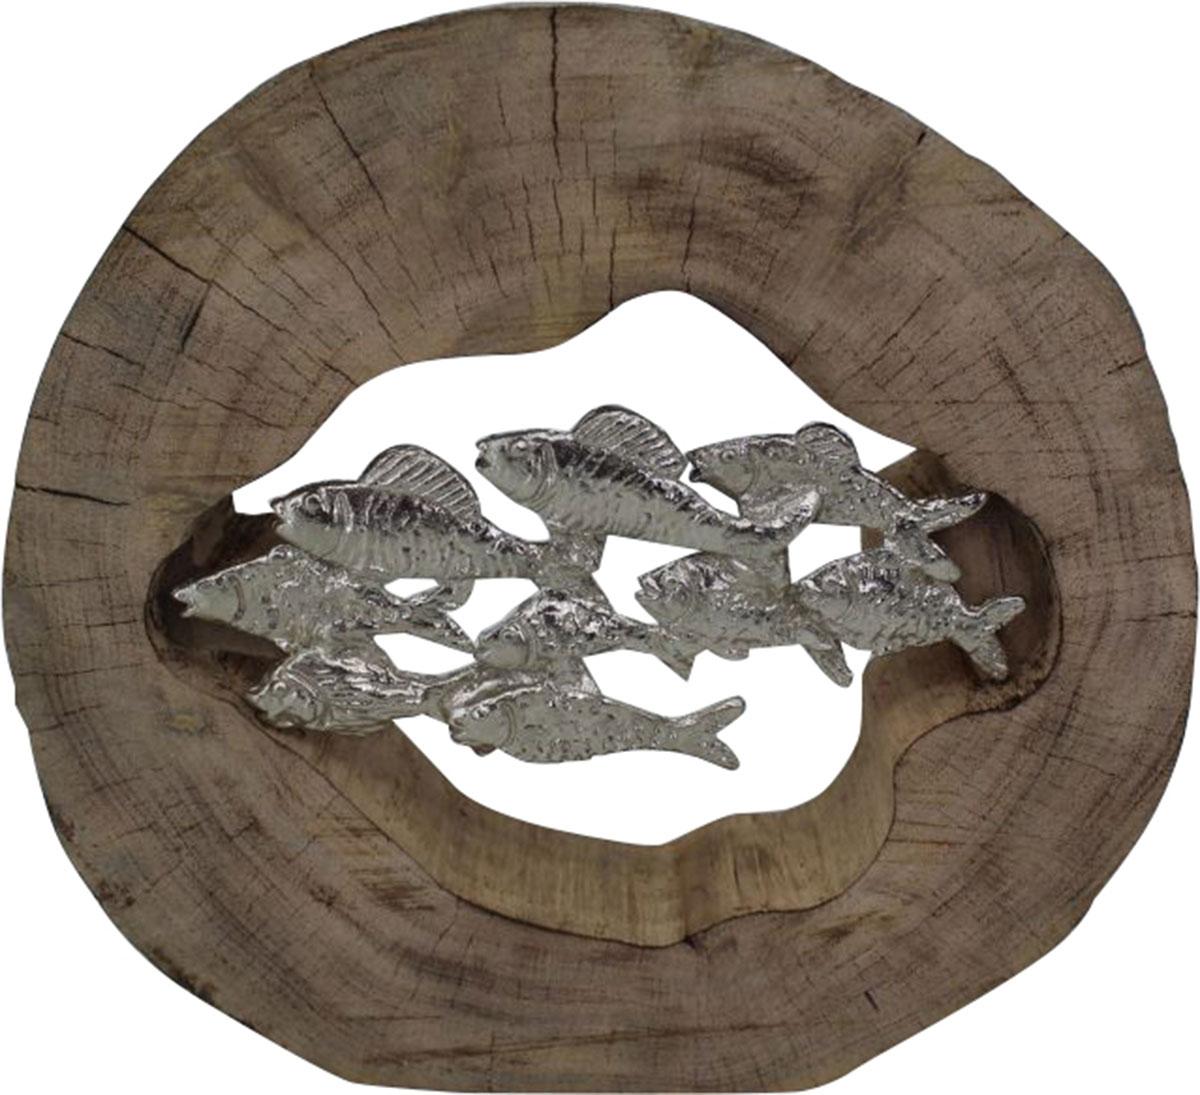 Ren-Wil Pesce Sculpture - Silver/Brown